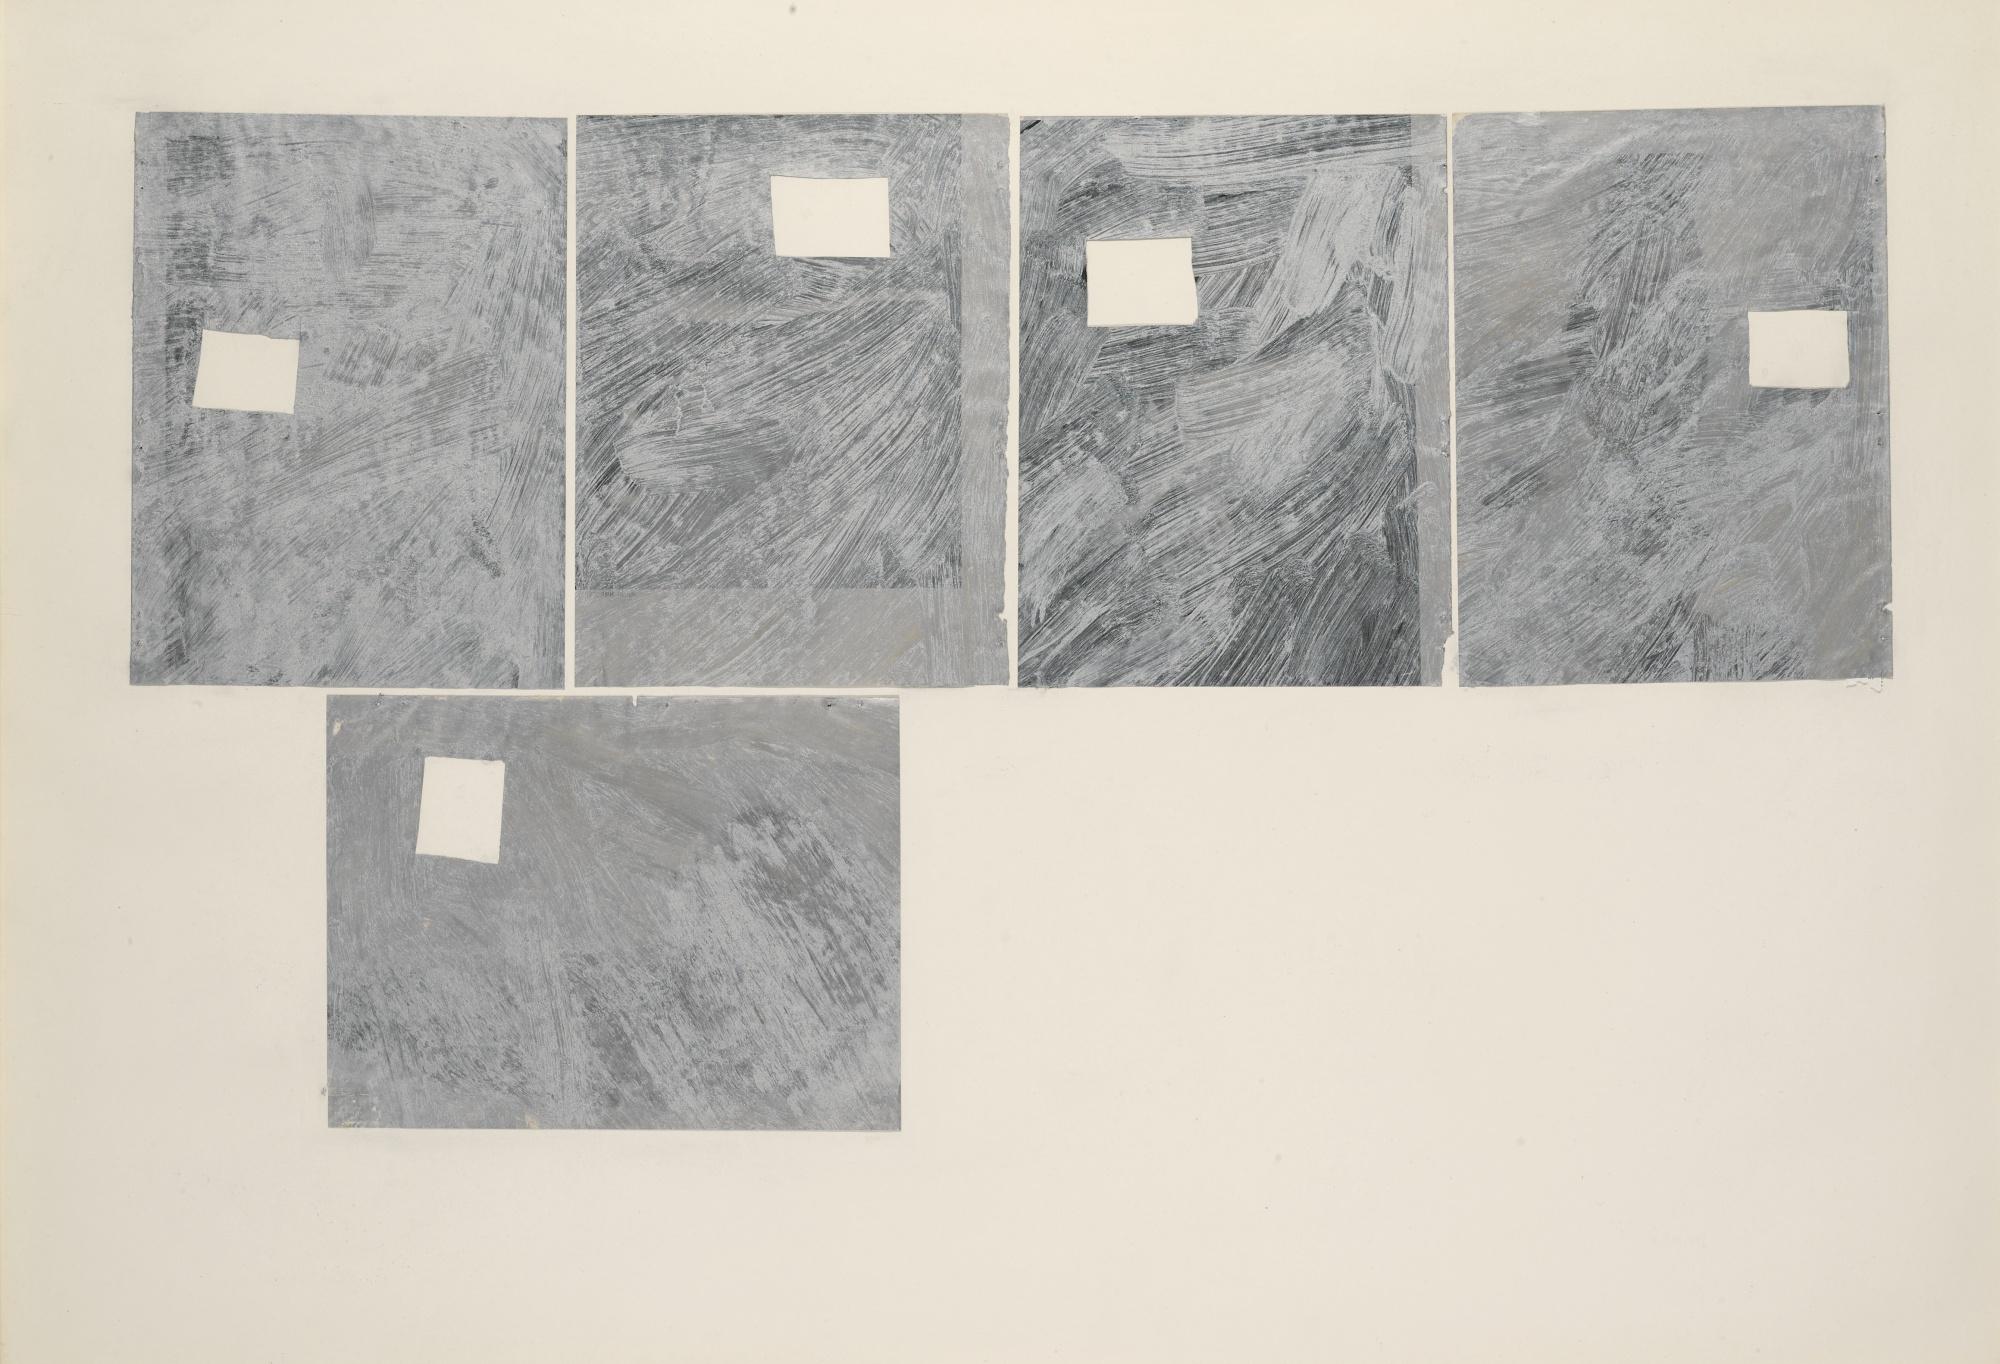 Joseph Beuys-Untitled-1963